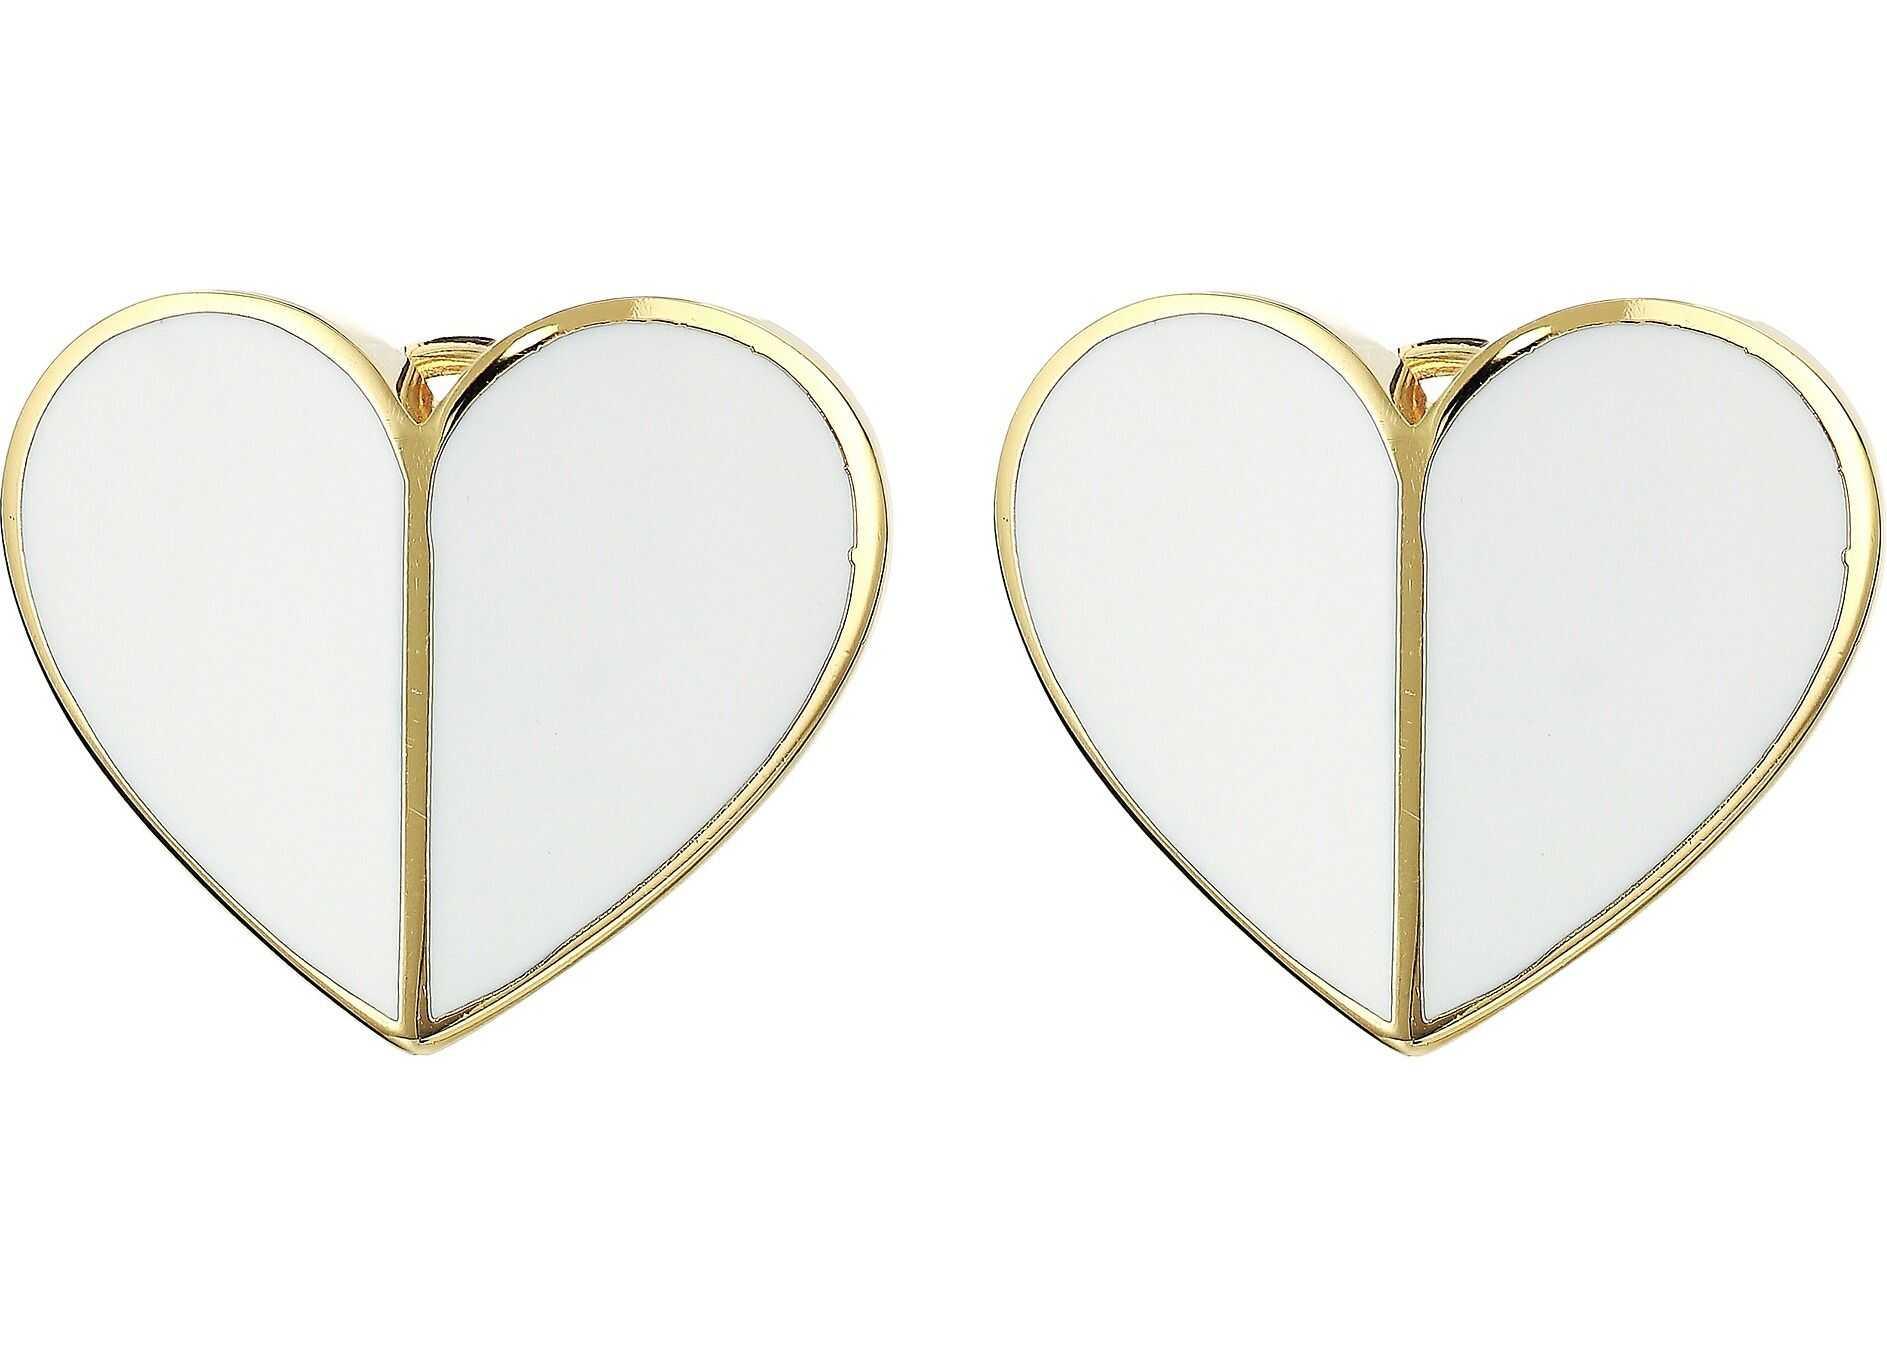 Kate Spade New York Heritage Spade Heart Statement Studs Earrings White